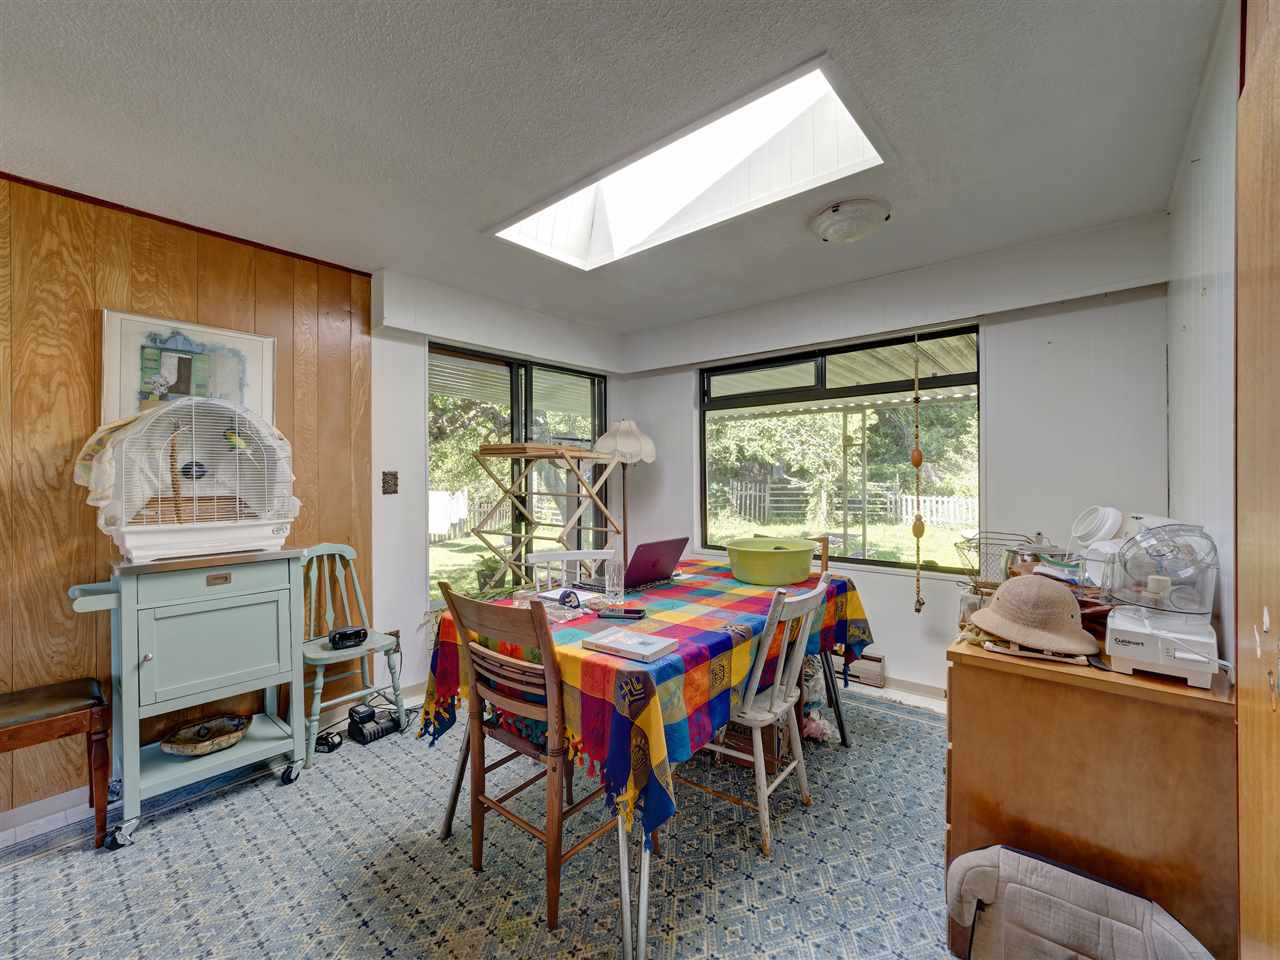 Photo 10: Photos: 5761 MCLAUGHAN Road in Sechelt: Sechelt District House for sale (Sunshine Coast)  : MLS®# R2479077